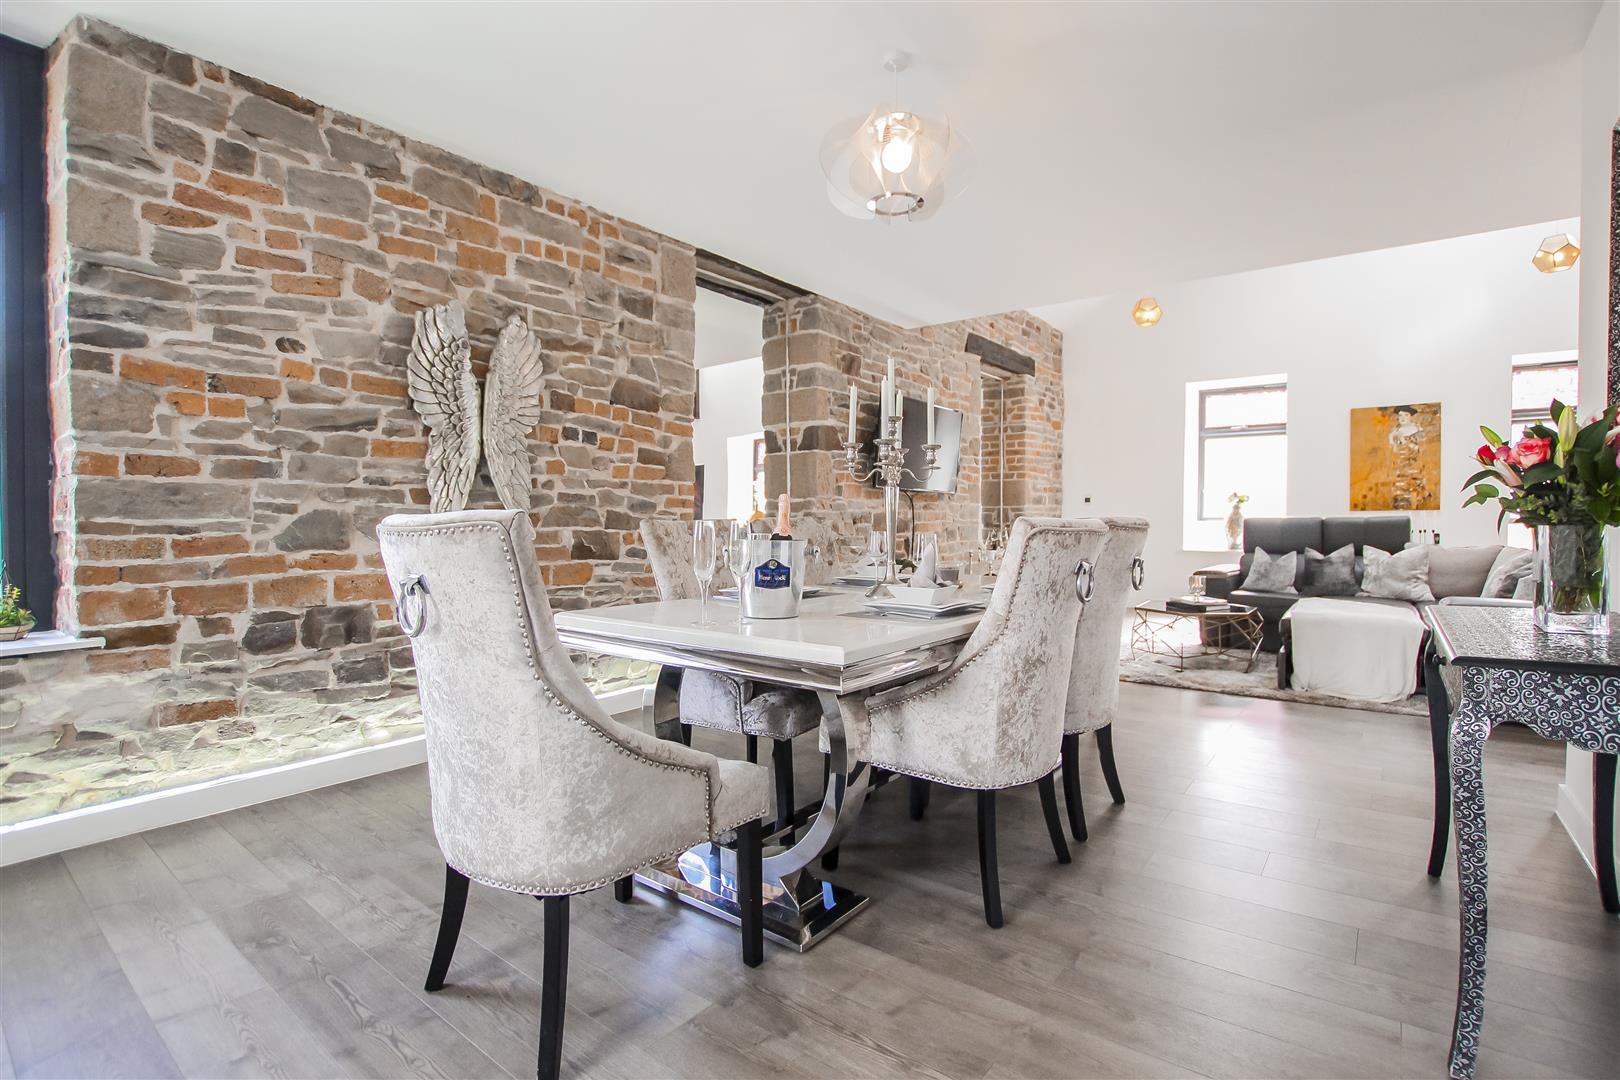 3 Bedroom Duplex Apartment For Sale - Image 5